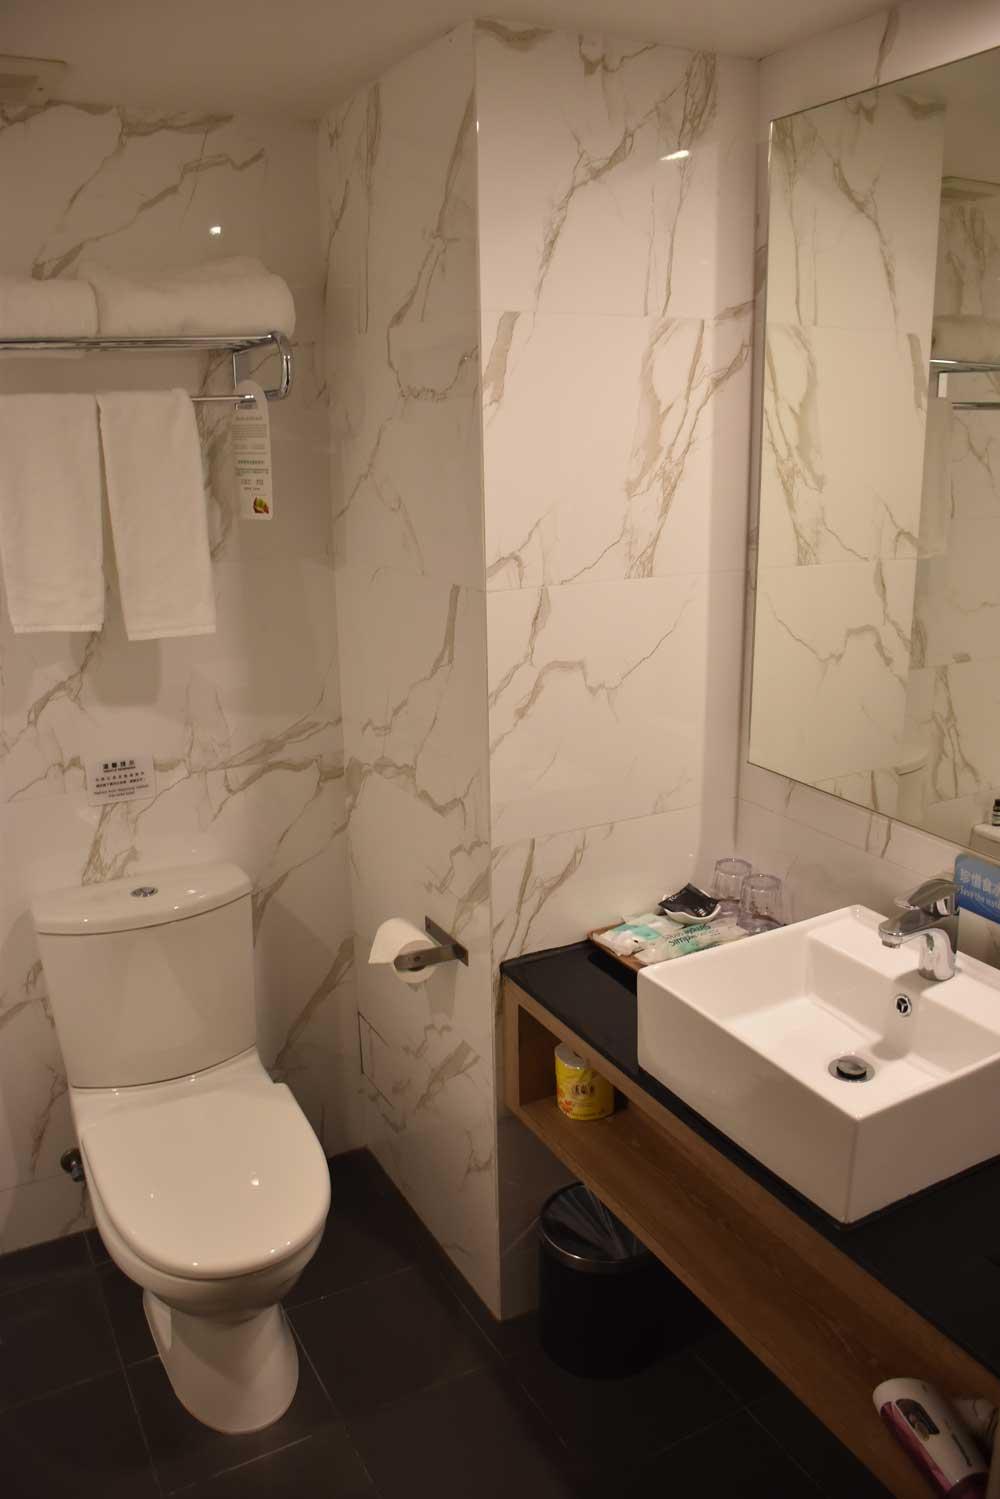 Macau budget hotels Macau hotel S bathroom